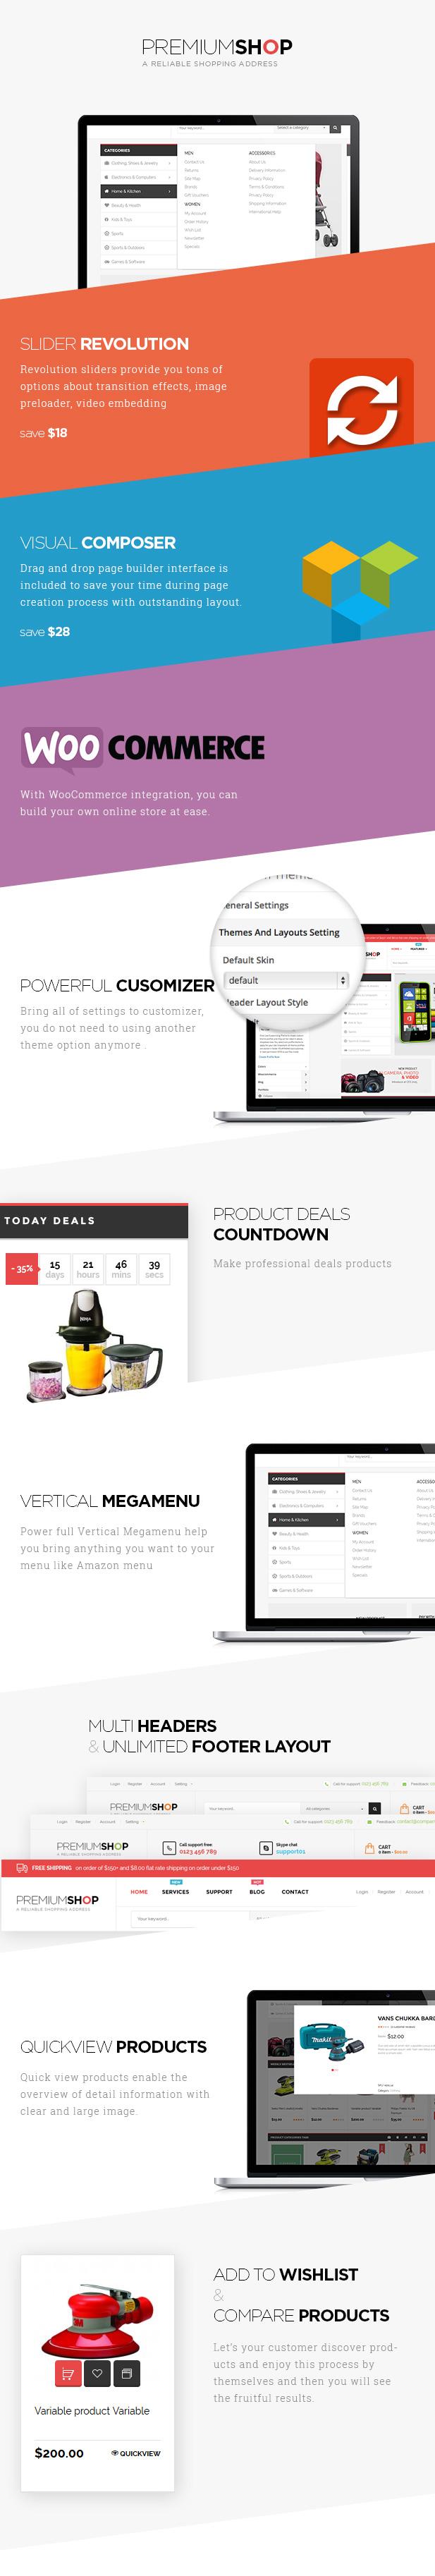 Premiumo - WooCommerce Shopping Theme